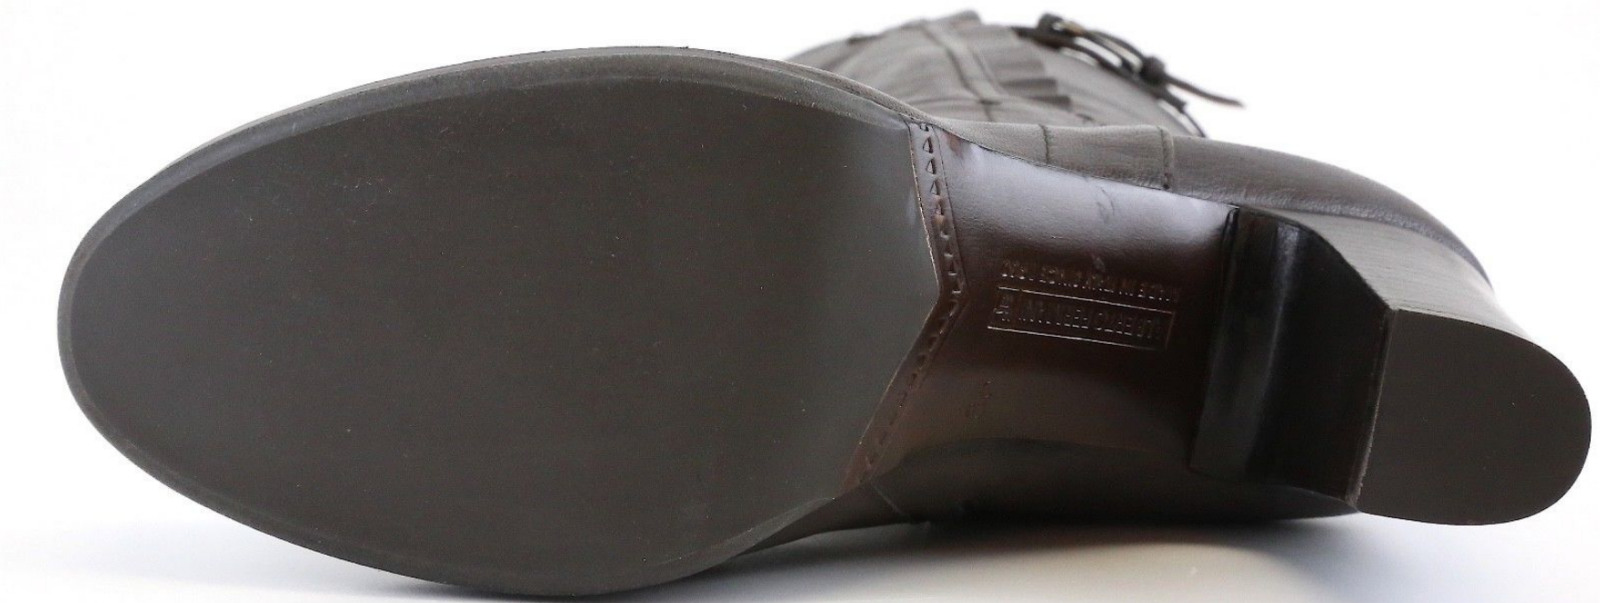 Alberto Fermani damen grau braun Leather Dress Stiefel Sz 36 36 36 EUR 2038  ae467c